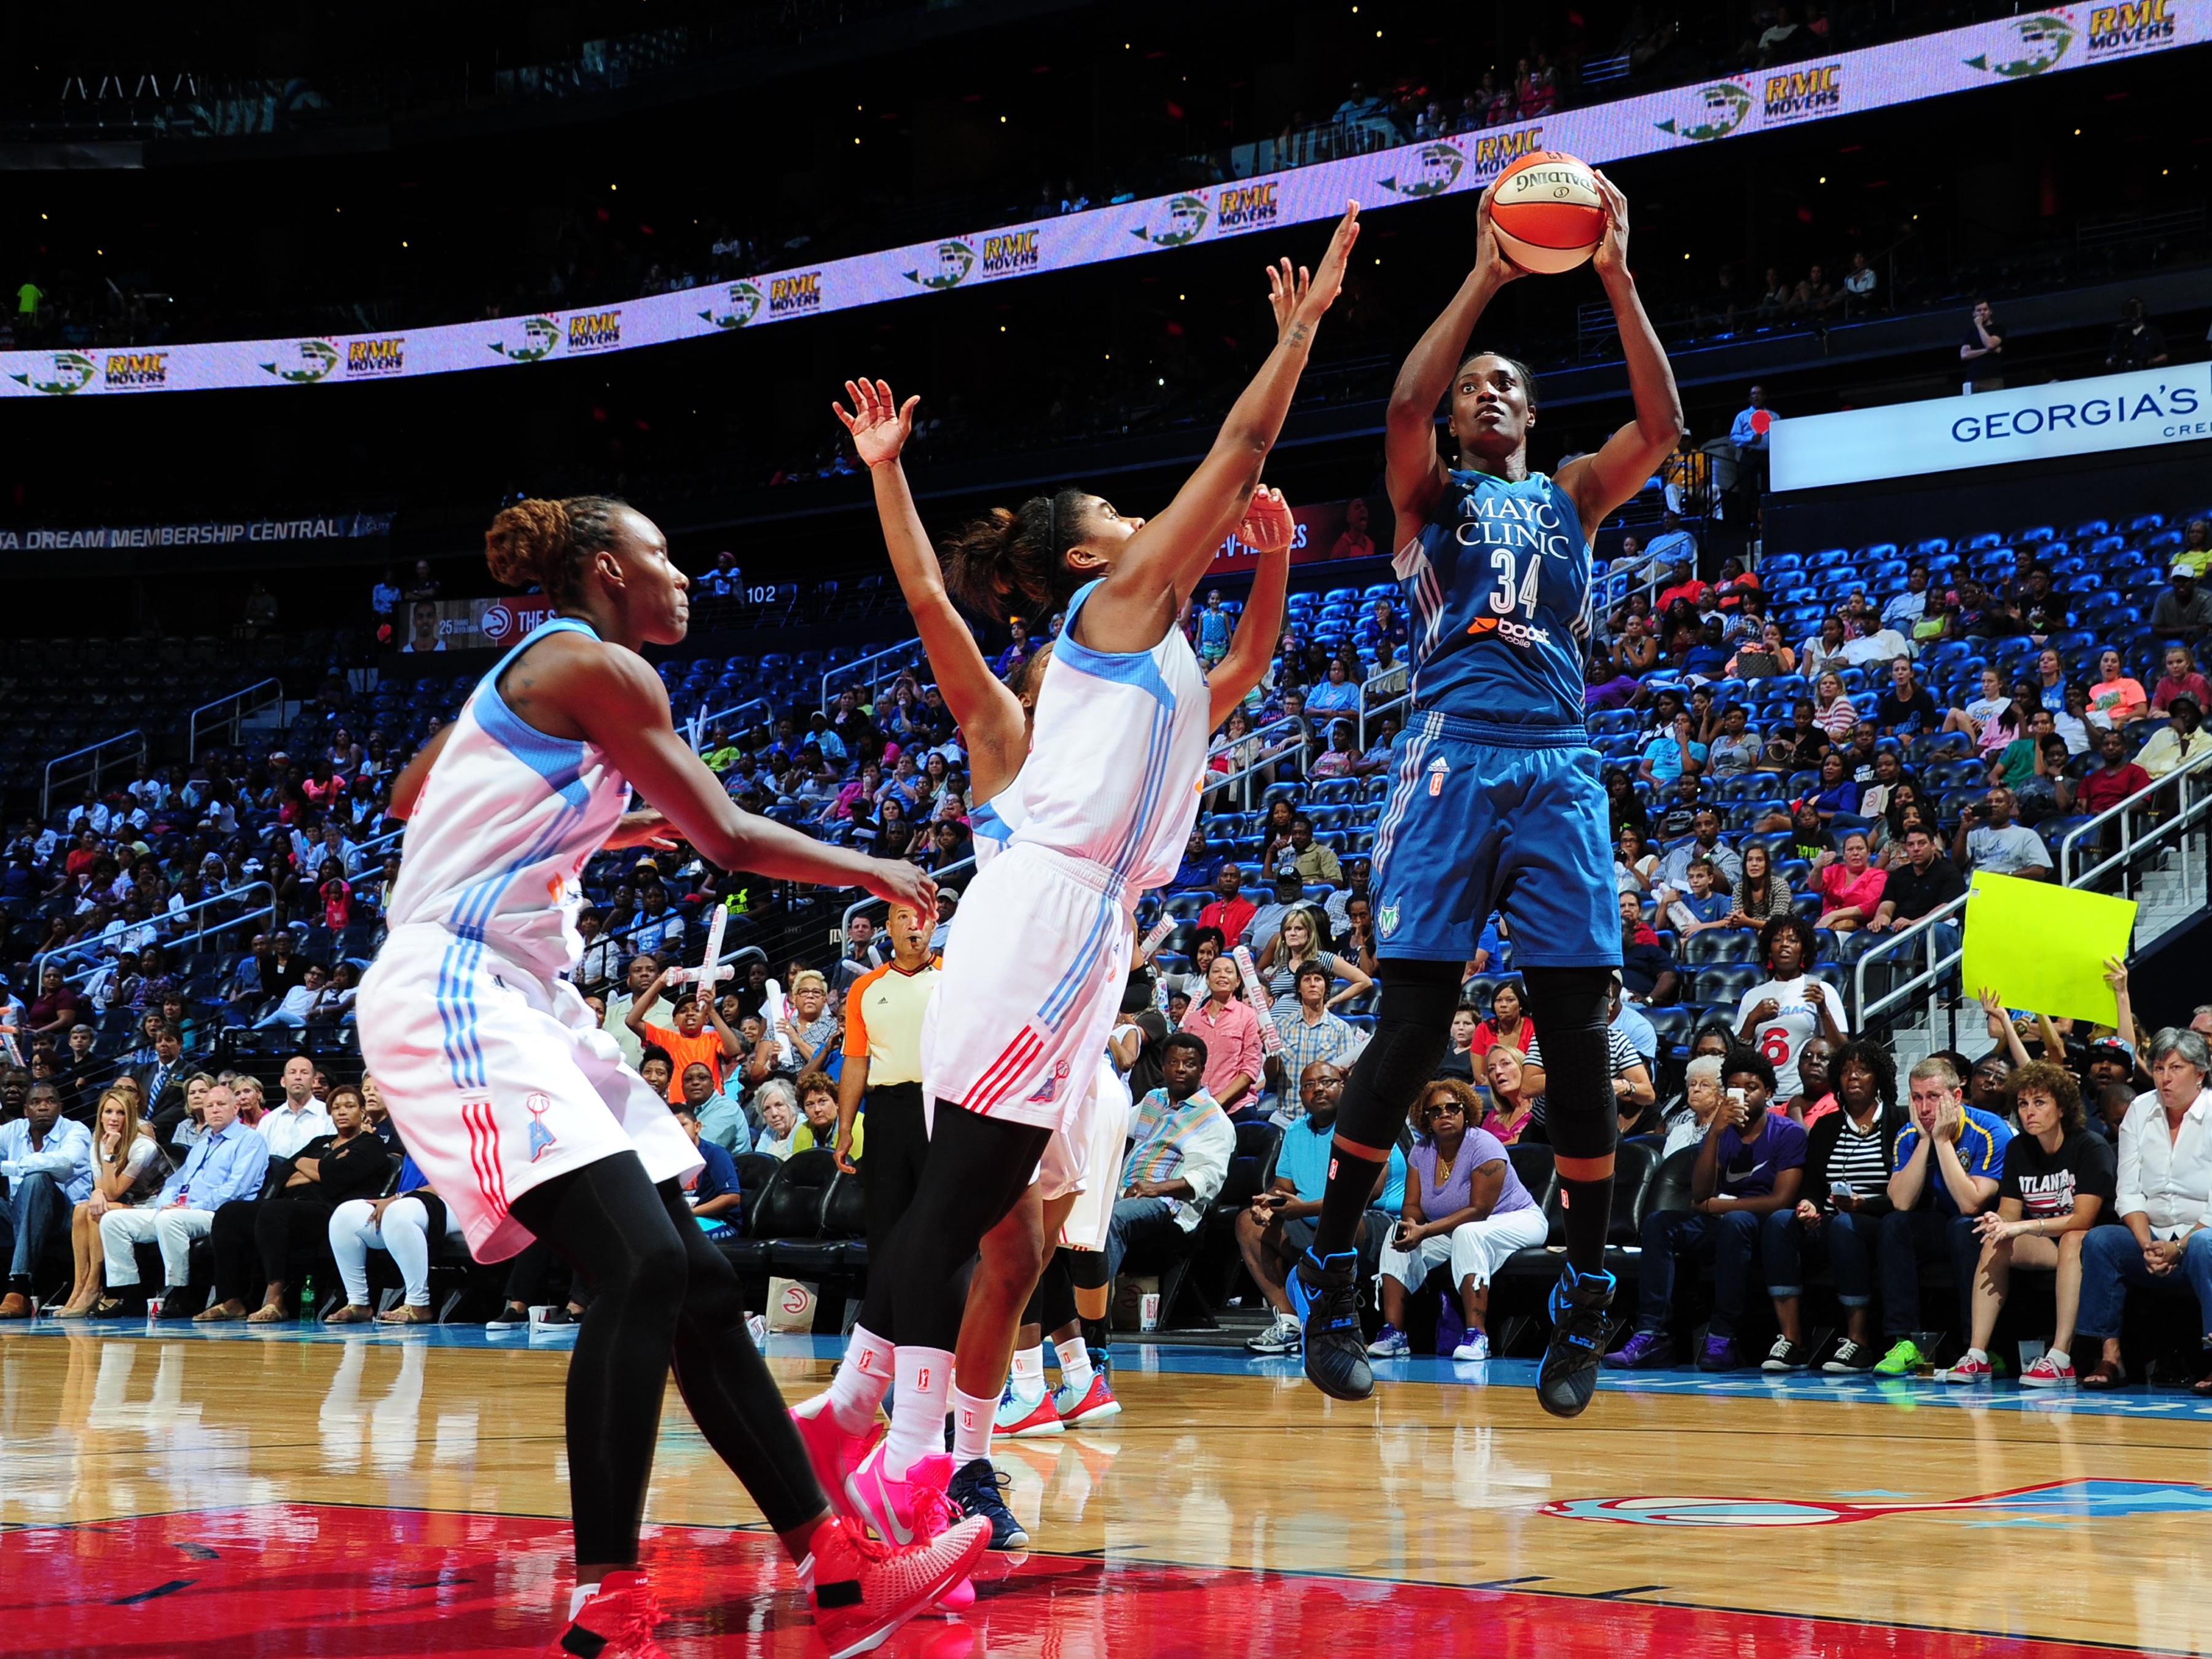 ATLANTA, GA - AUGUST 14: Sylvia Fowles #34 of the Minnesota Lynx shoots the ball against the Atlanta Dream on August 14, 2015 at Philips Arena in Atlanta, Georgia.  (Photo by Scott Cunningham/NBAE via Getty Images)